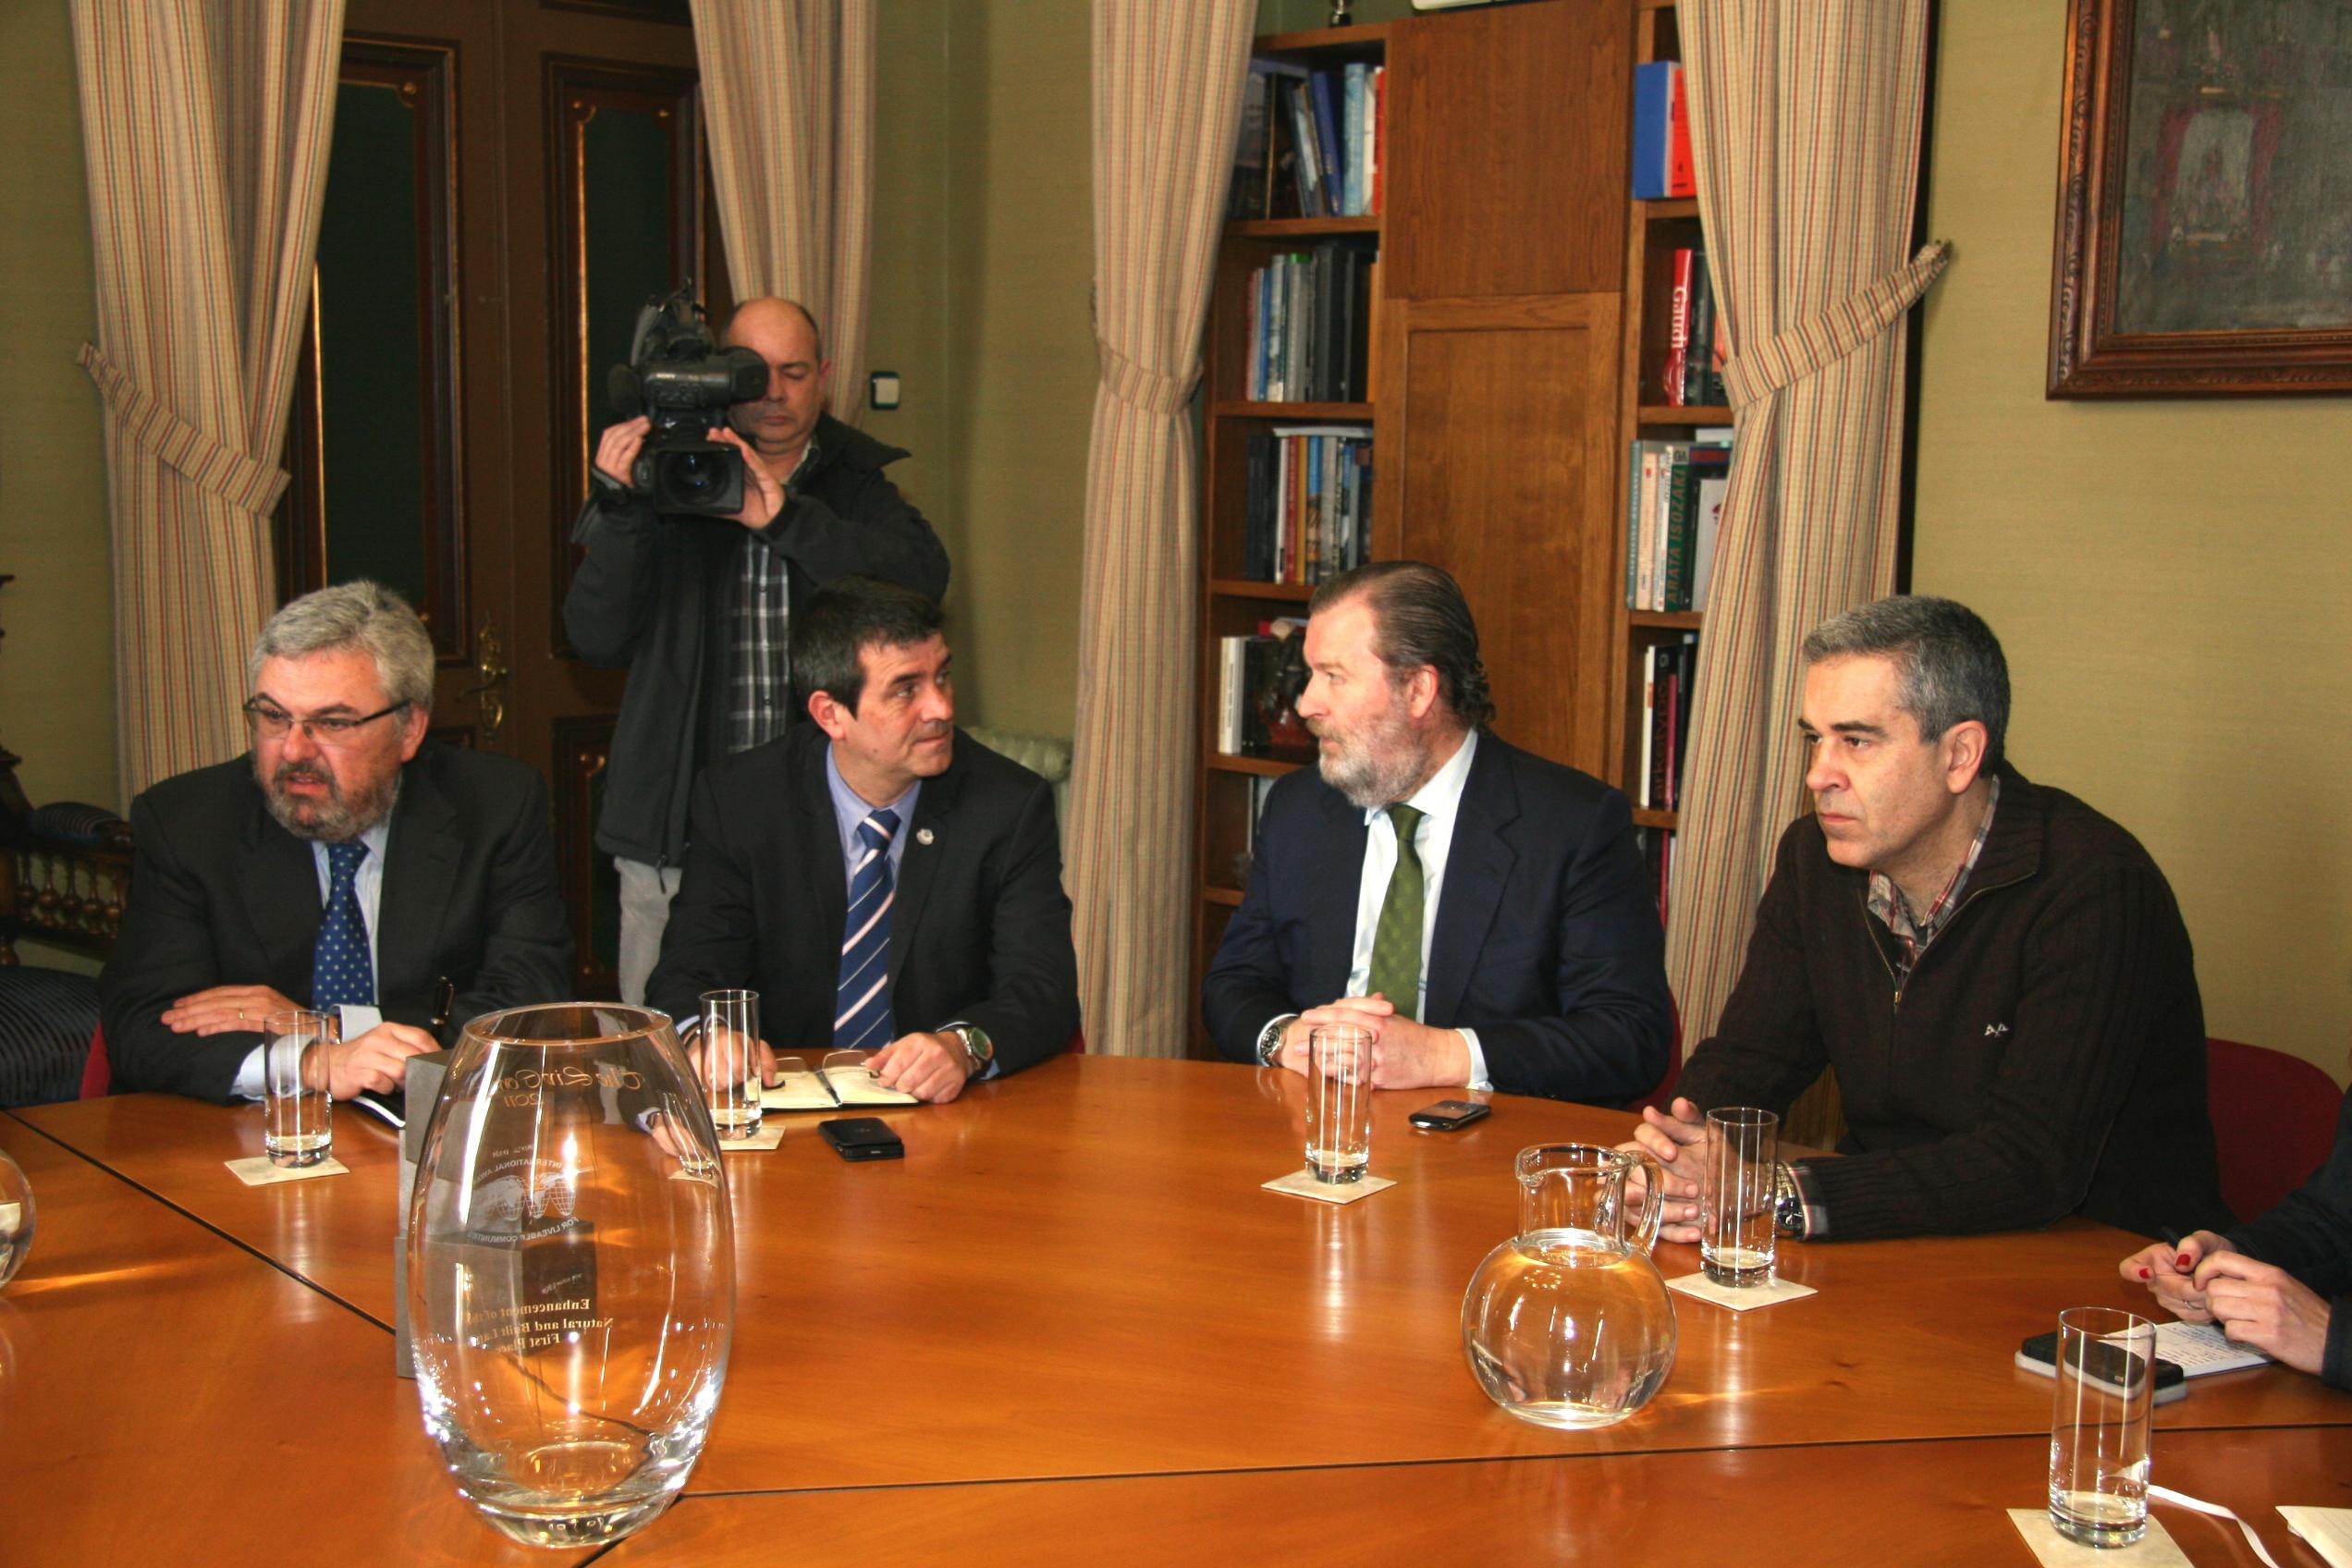 reunion_seguridad_ayuntamiento_bilbao_dendak_03.jpg